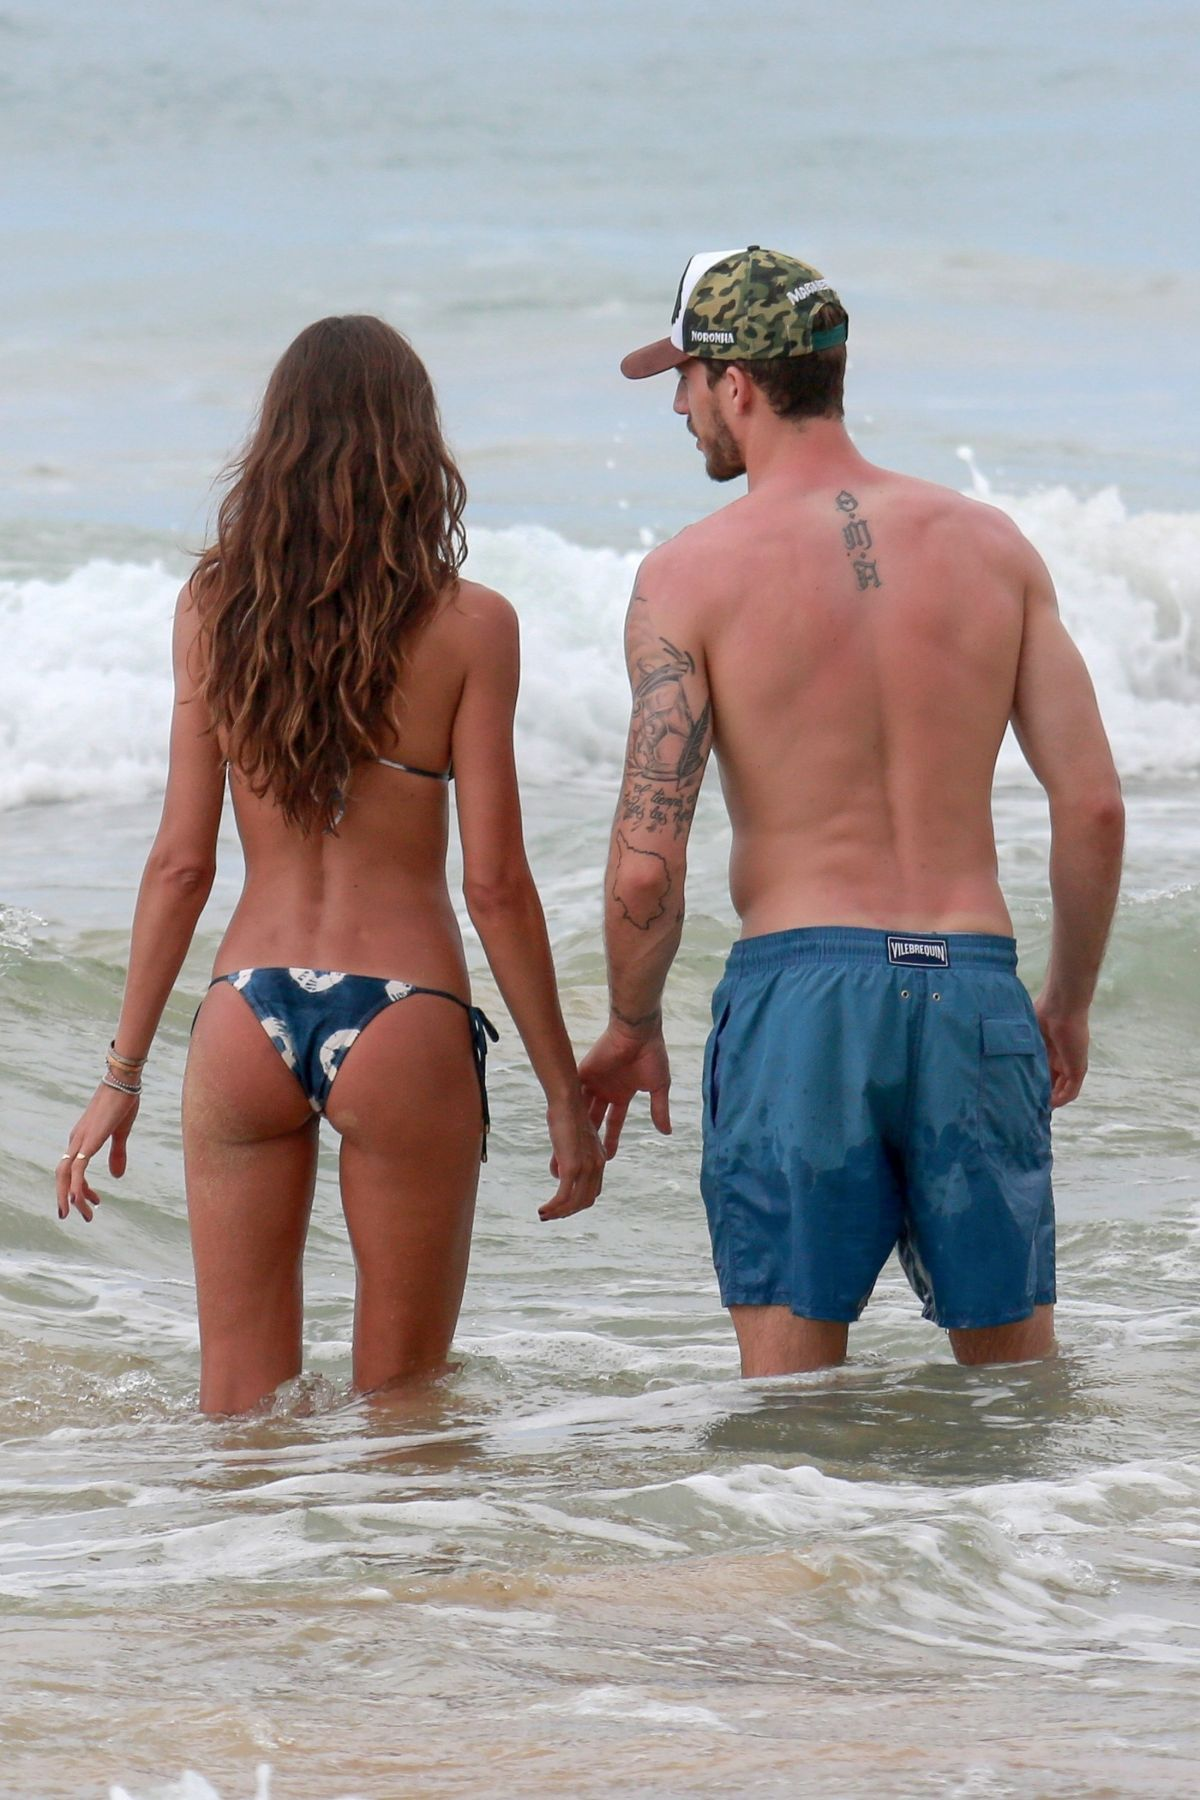 Izabel Goulart in Bikini and Kevin Trapp on the beach in Fernando de Noronha Pic 1 of 35